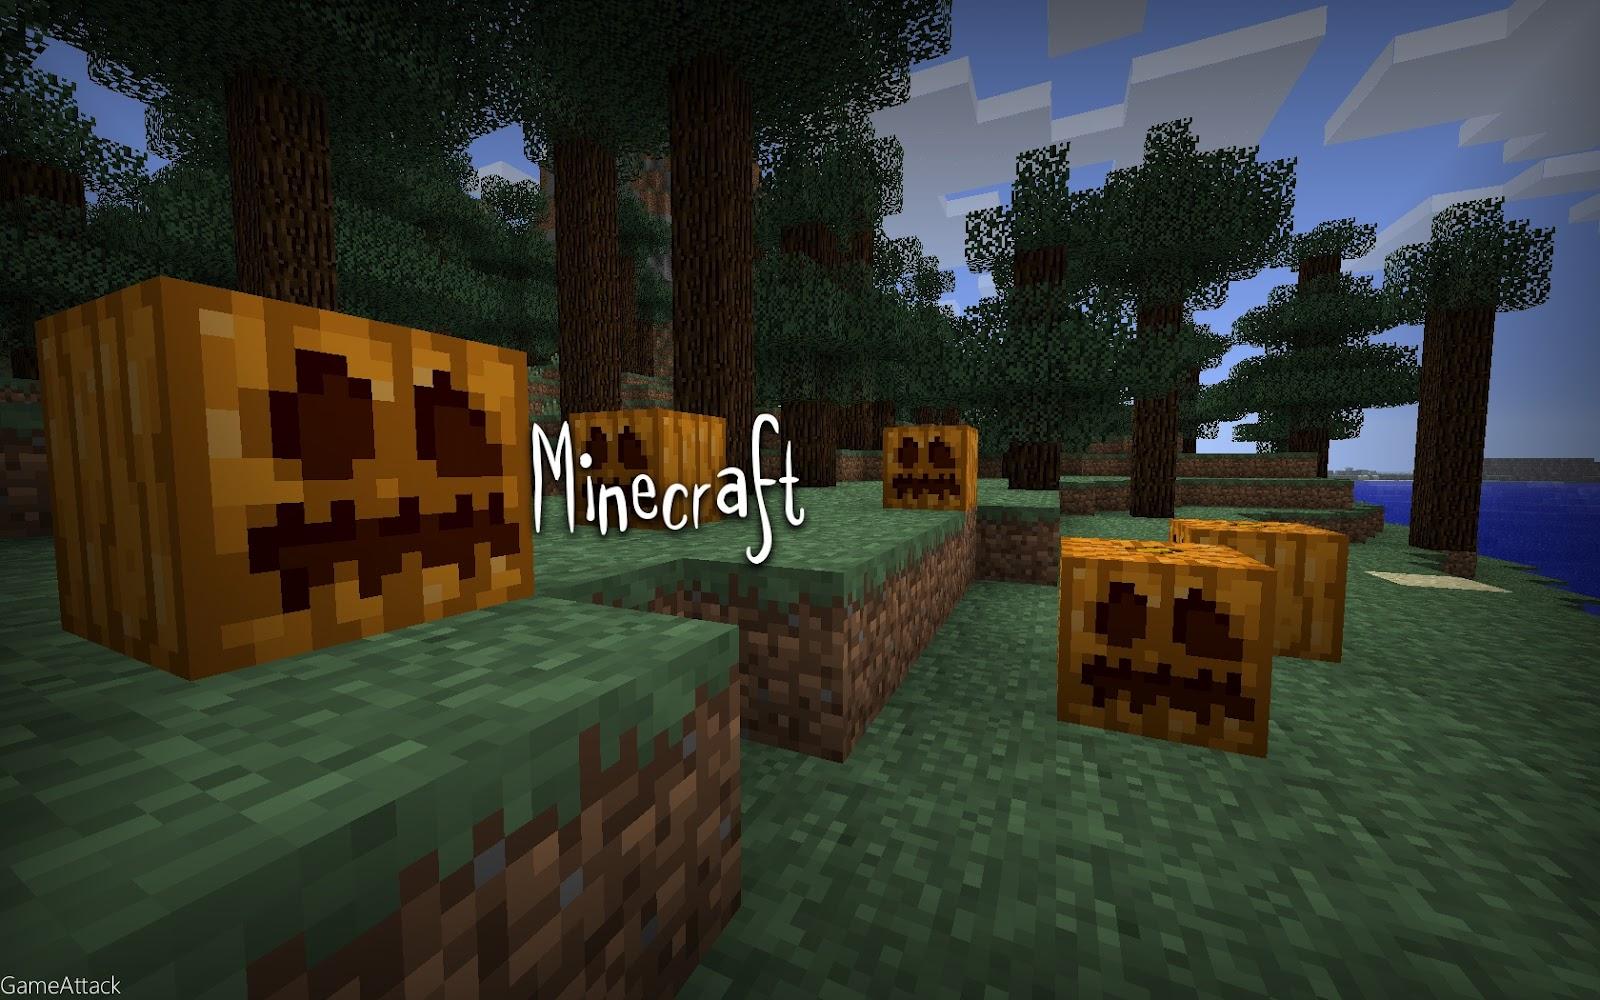 http://4.bp.blogspot.com/-fvVk5CAgENo/UBGZX-2m9II/AAAAAAAAACk/CuS9cFU4KjA/s1600/Minecraft-Wallpaper-3.jpg